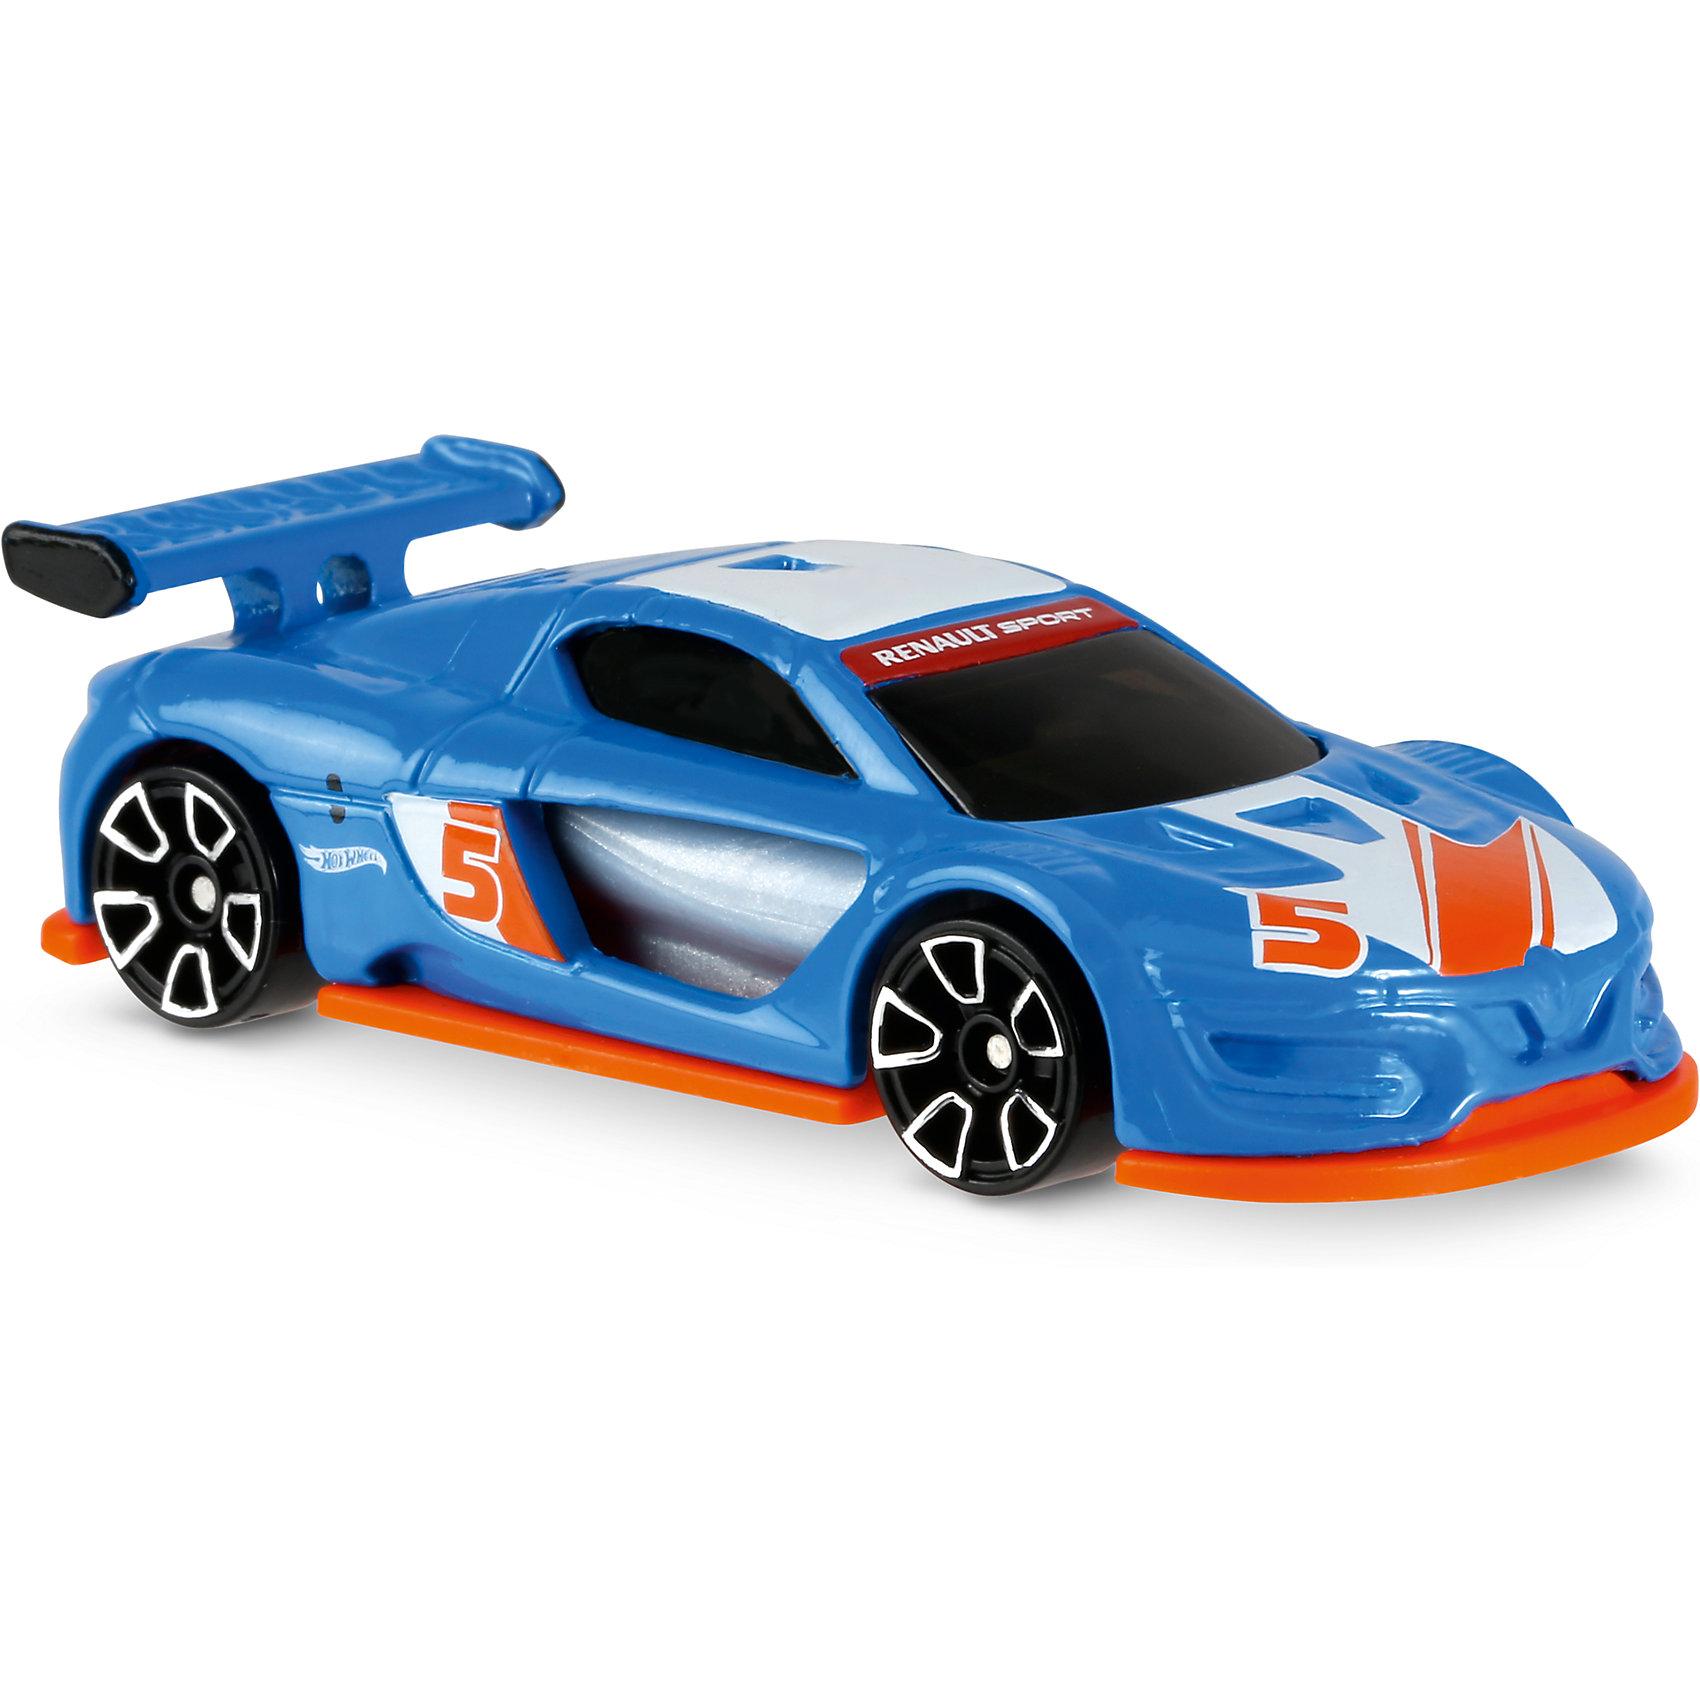 Базовая машинка Hot Wheels, Renault Sport R.S. 01Машинки<br><br><br>Ширина мм: 110<br>Глубина мм: 45<br>Высота мм: 110<br>Вес г: 30<br>Возраст от месяцев: 36<br>Возраст до месяцев: 96<br>Пол: Мужской<br>Возраст: Детский<br>SKU: 7111084